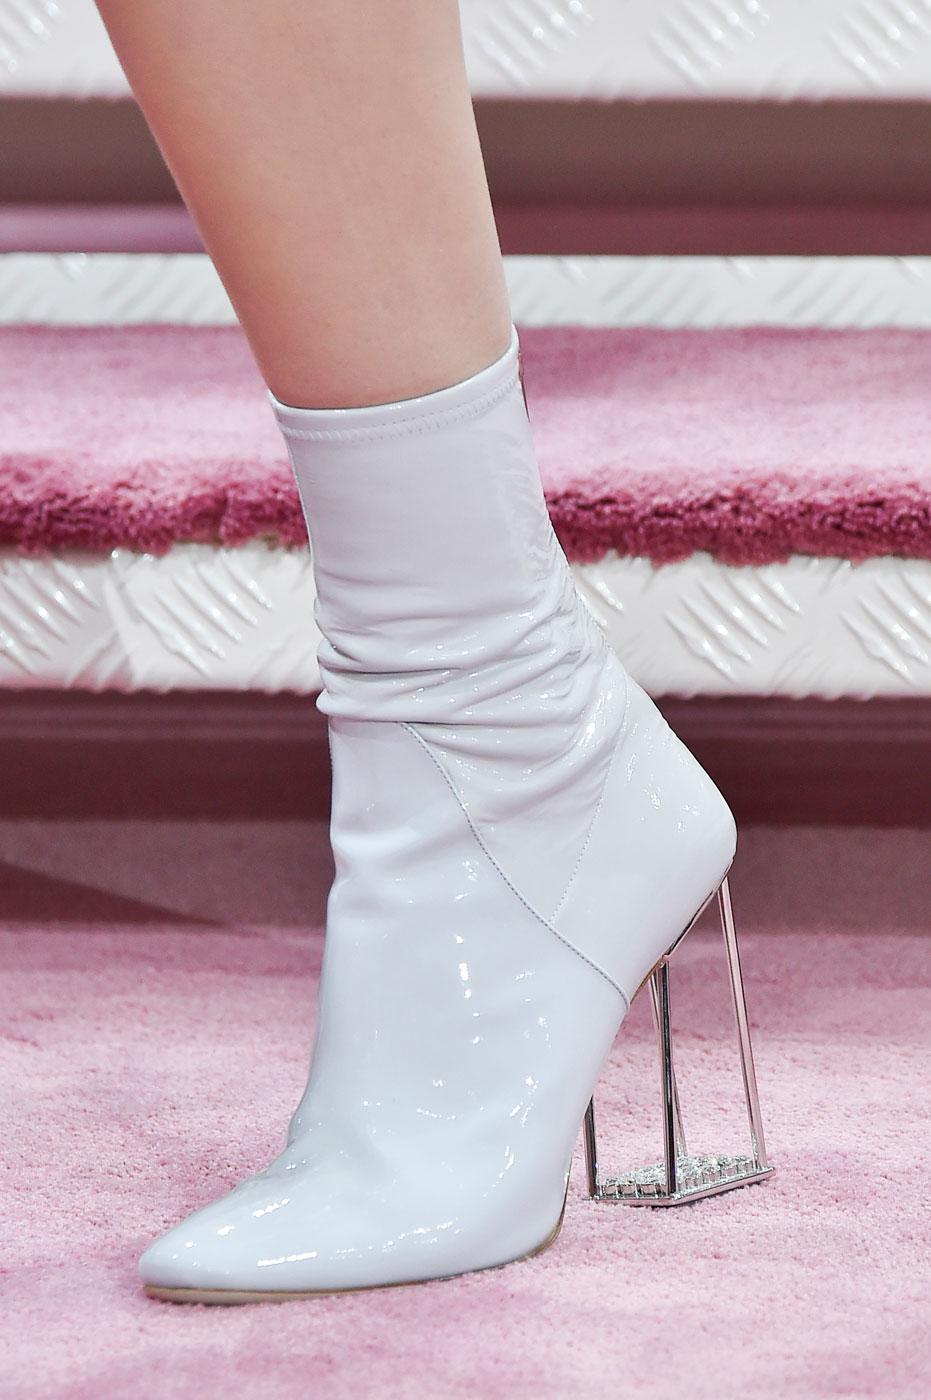 Christian-Dior-fashion-runway-show-close-ups-haute-couture-paris-spring-summer-2015-the-impression-078